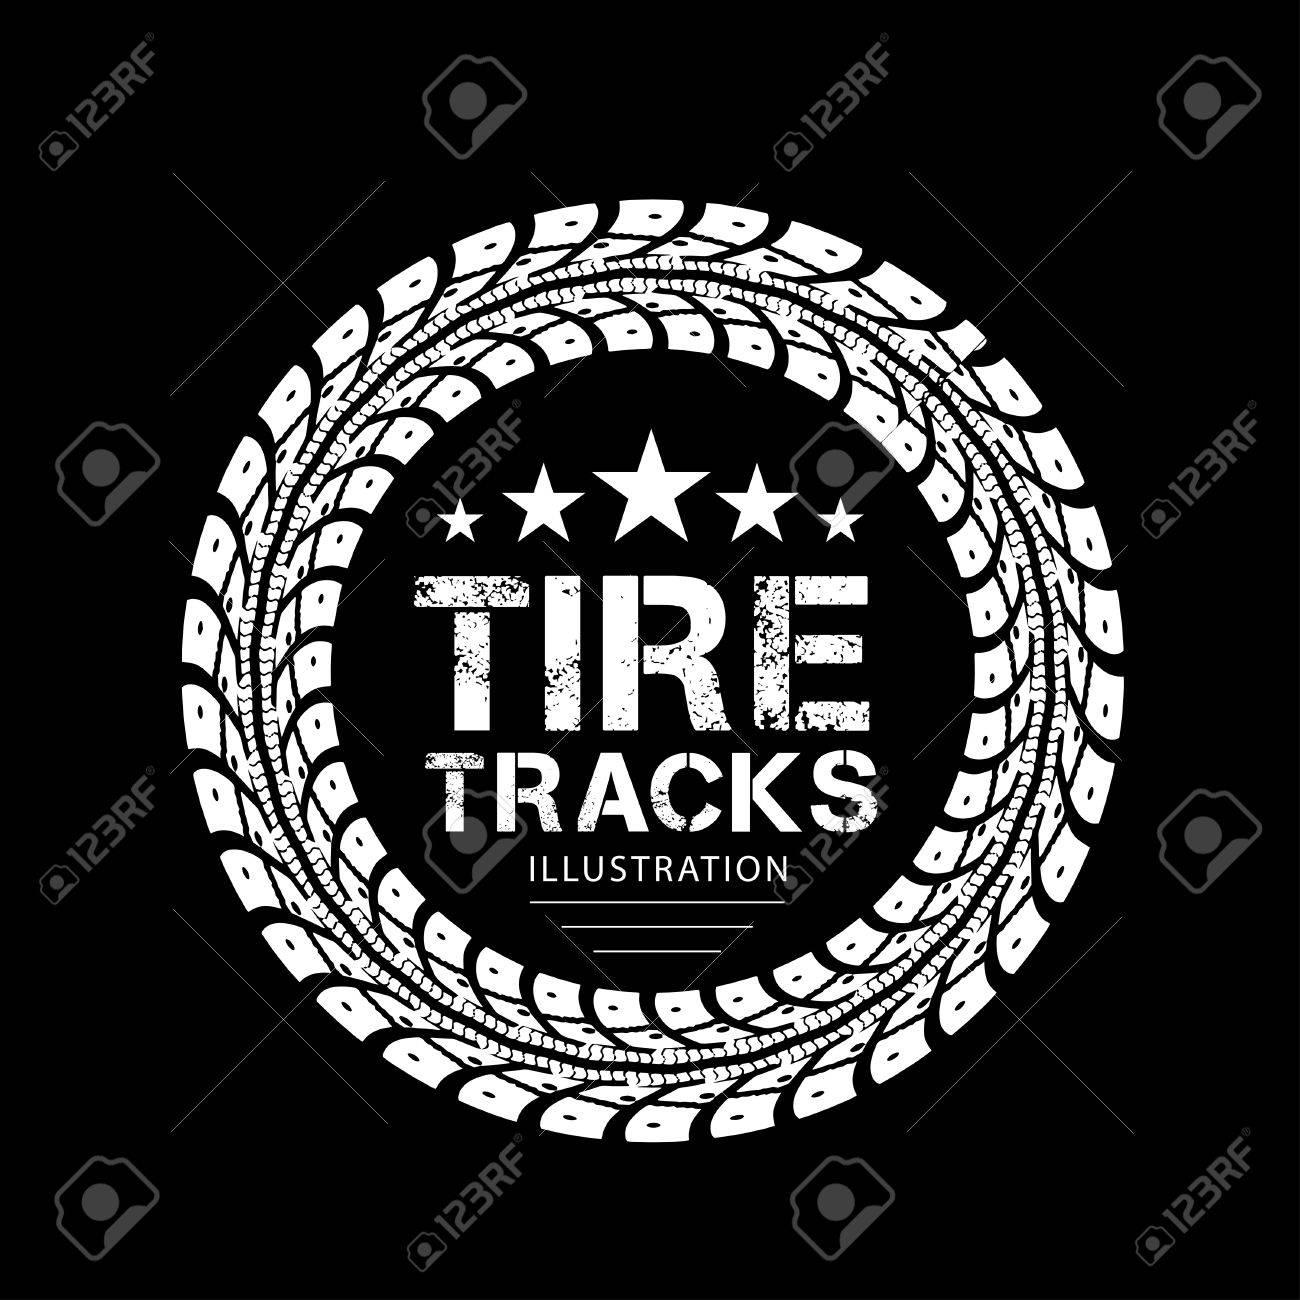 Tire tracks Illustration on black background - 30450934